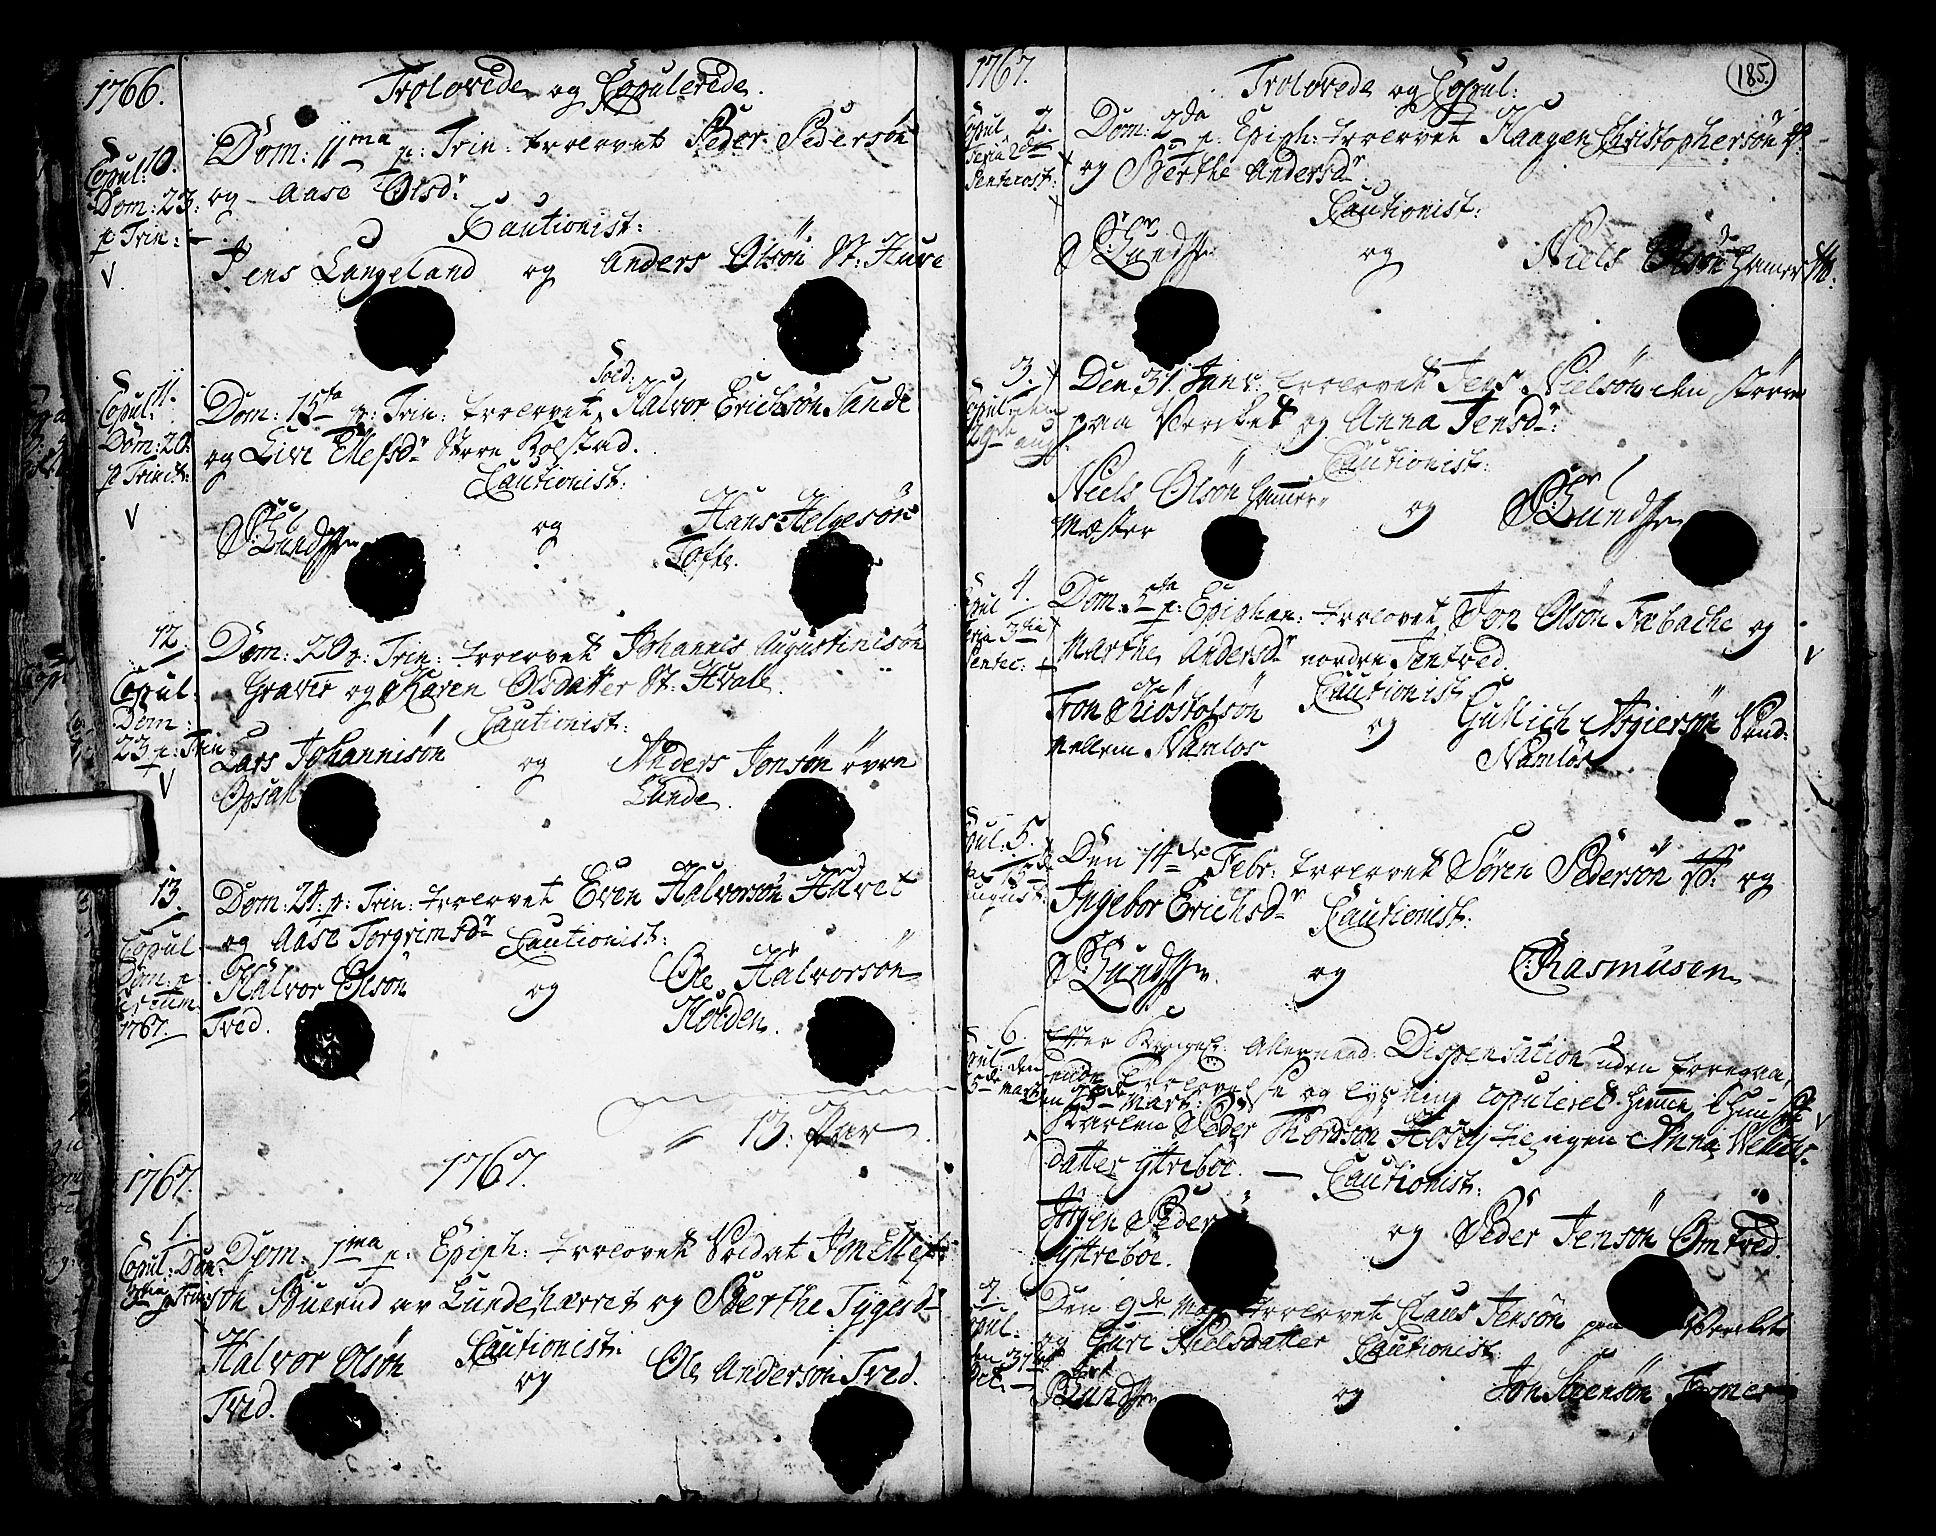 SAKO, Holla kirkebøker, F/Fa/L0001: Ministerialbok nr. 1, 1717-1779, s. 185